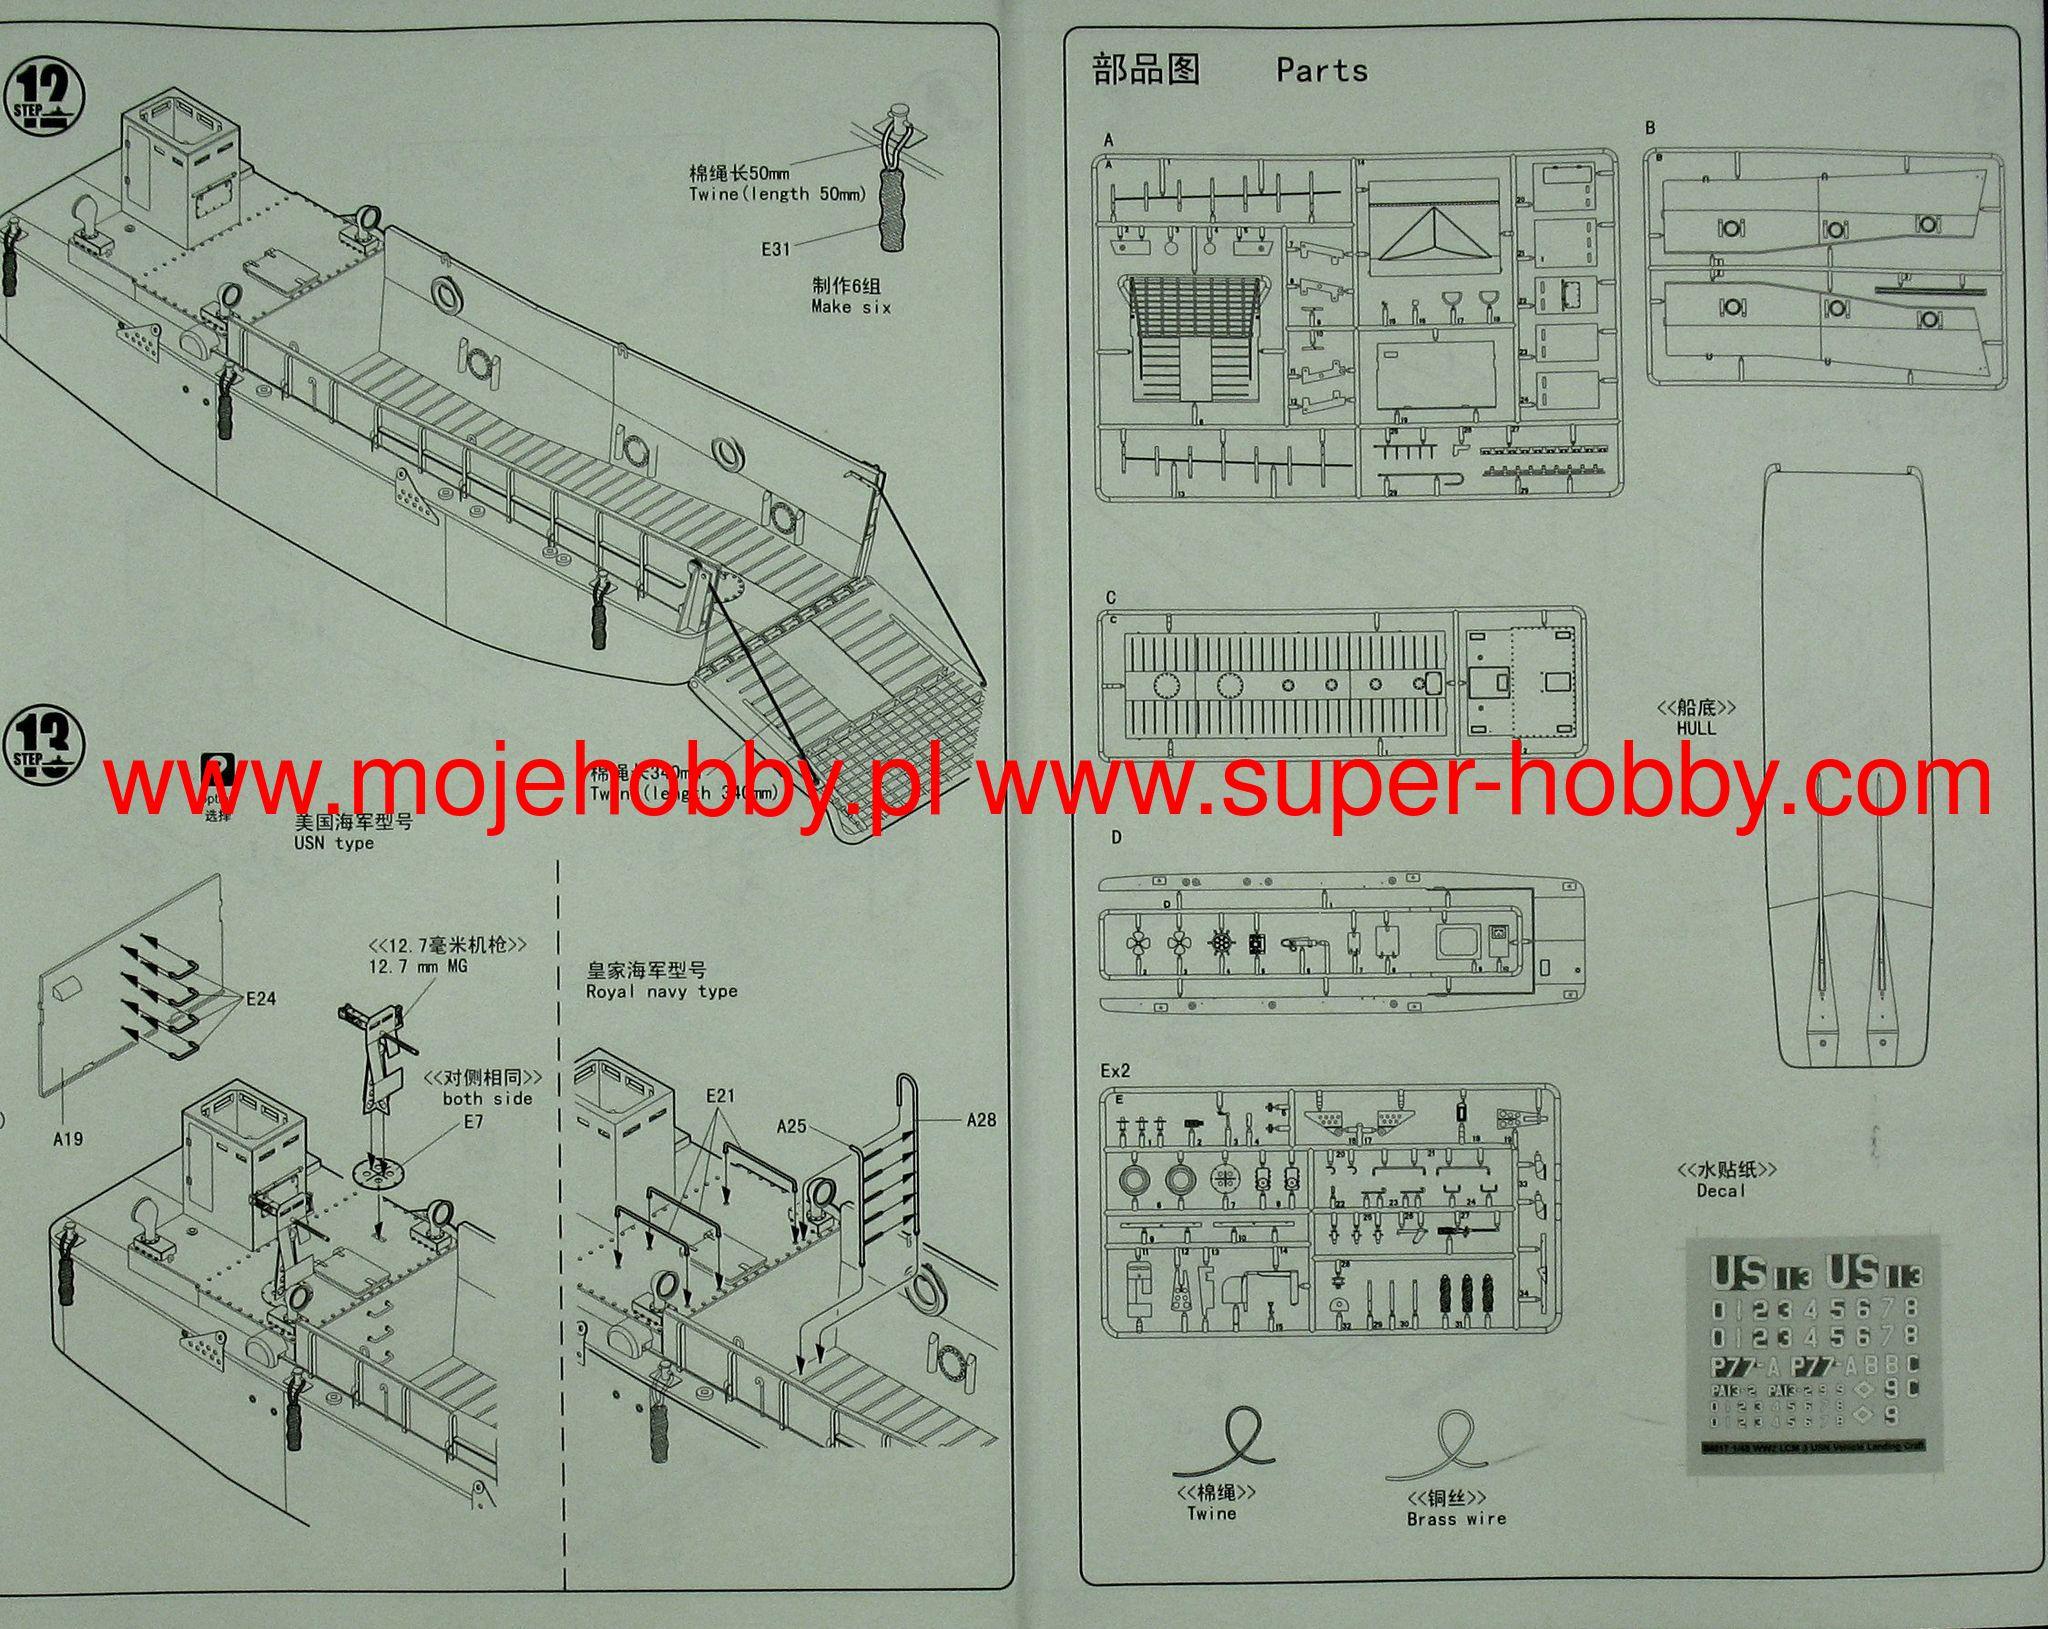 U.S LCM-3 Landing Craft Hobby Boss 84817 on needle diagram, splinter diagram, altitude diagram, pioneer diagram, parking diagram,